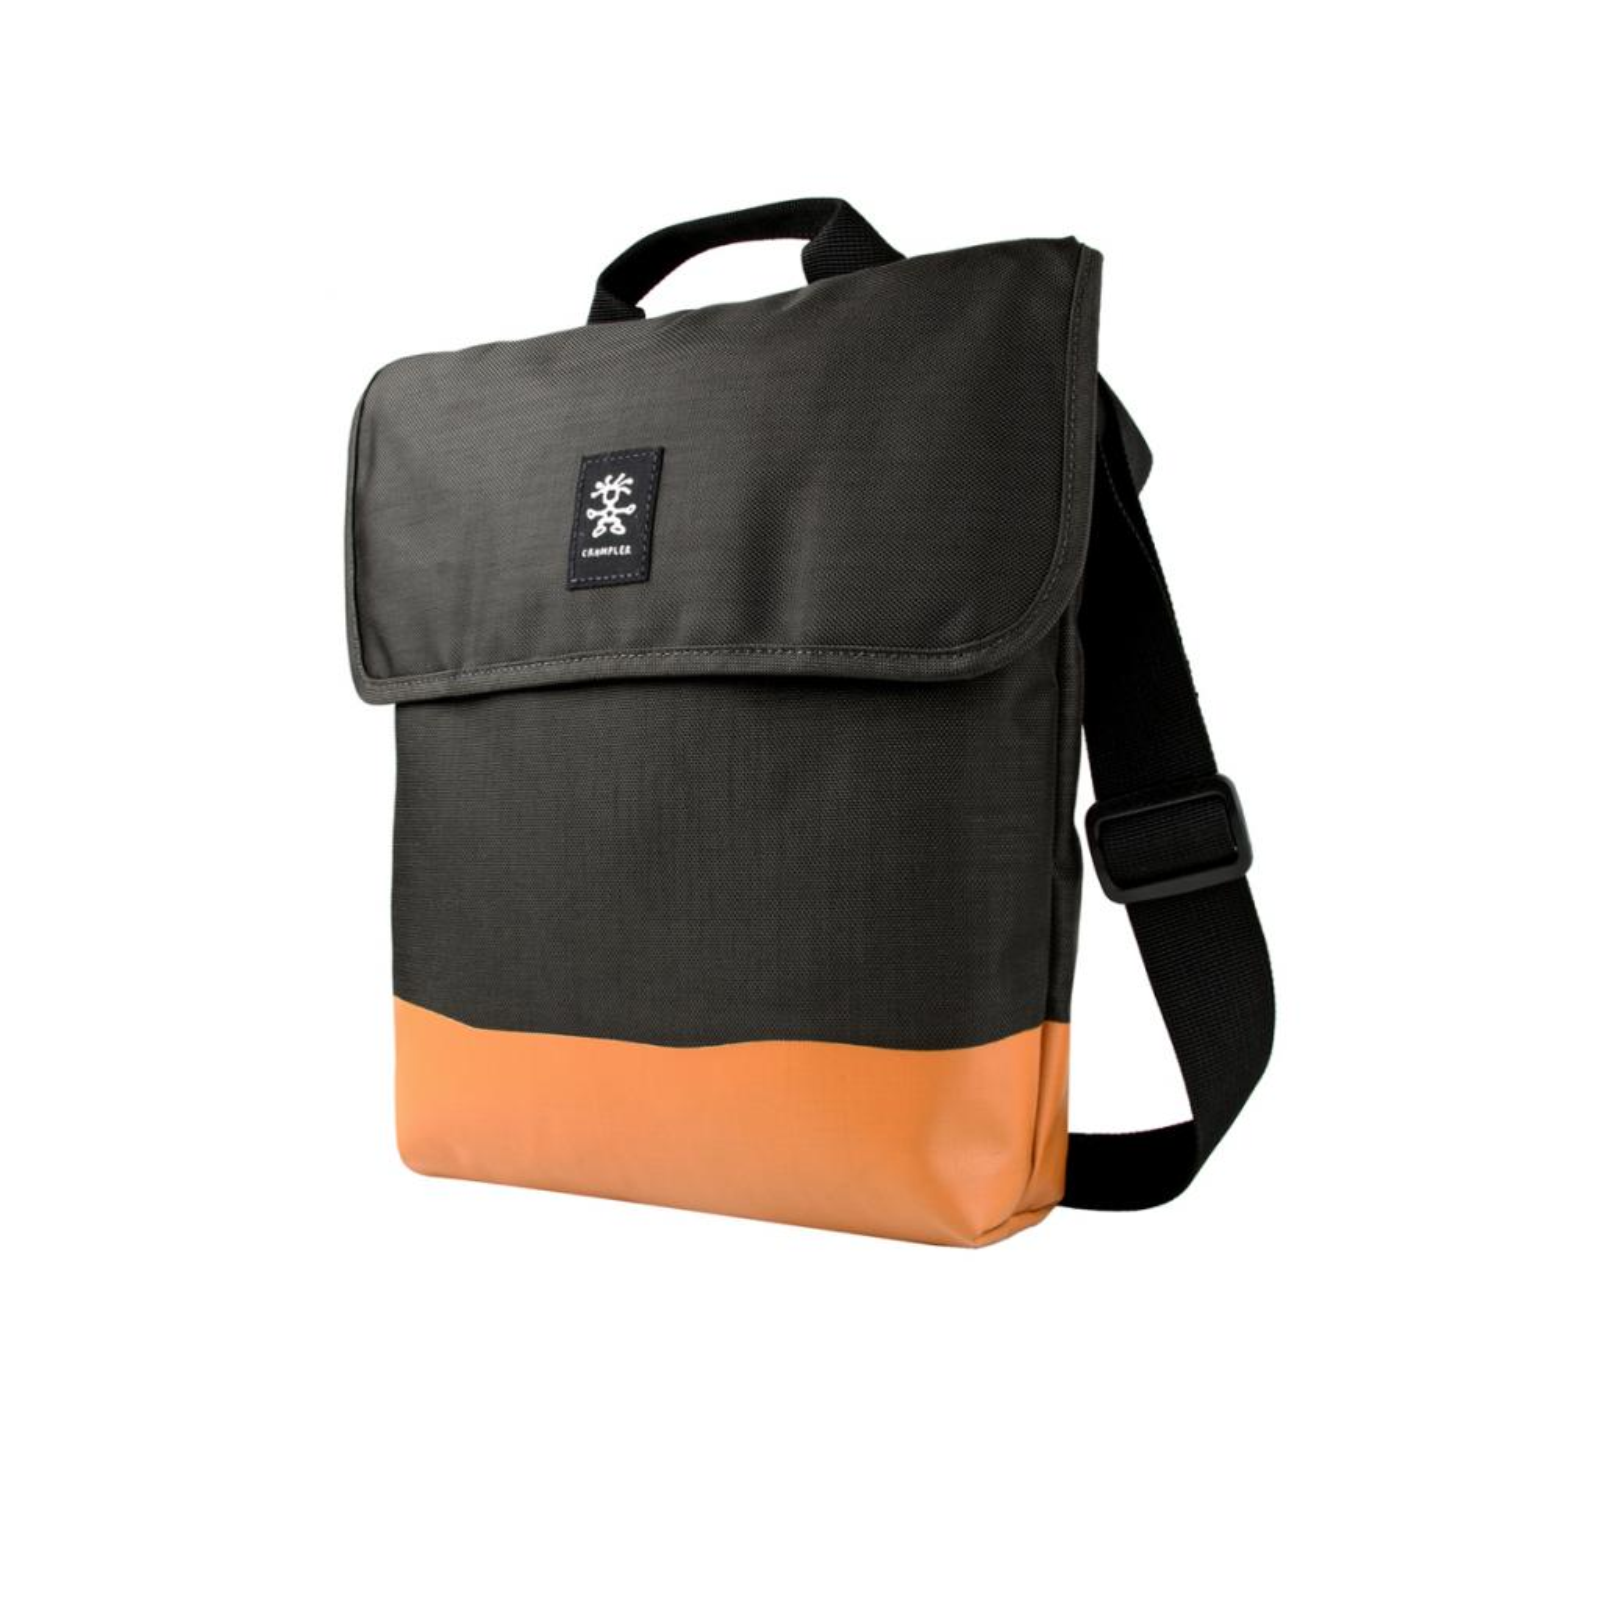 Чехол для планшета Crumpler 9 Private Surprise Sling Tablet/charcoal - orange (PSST-004) изображение 2